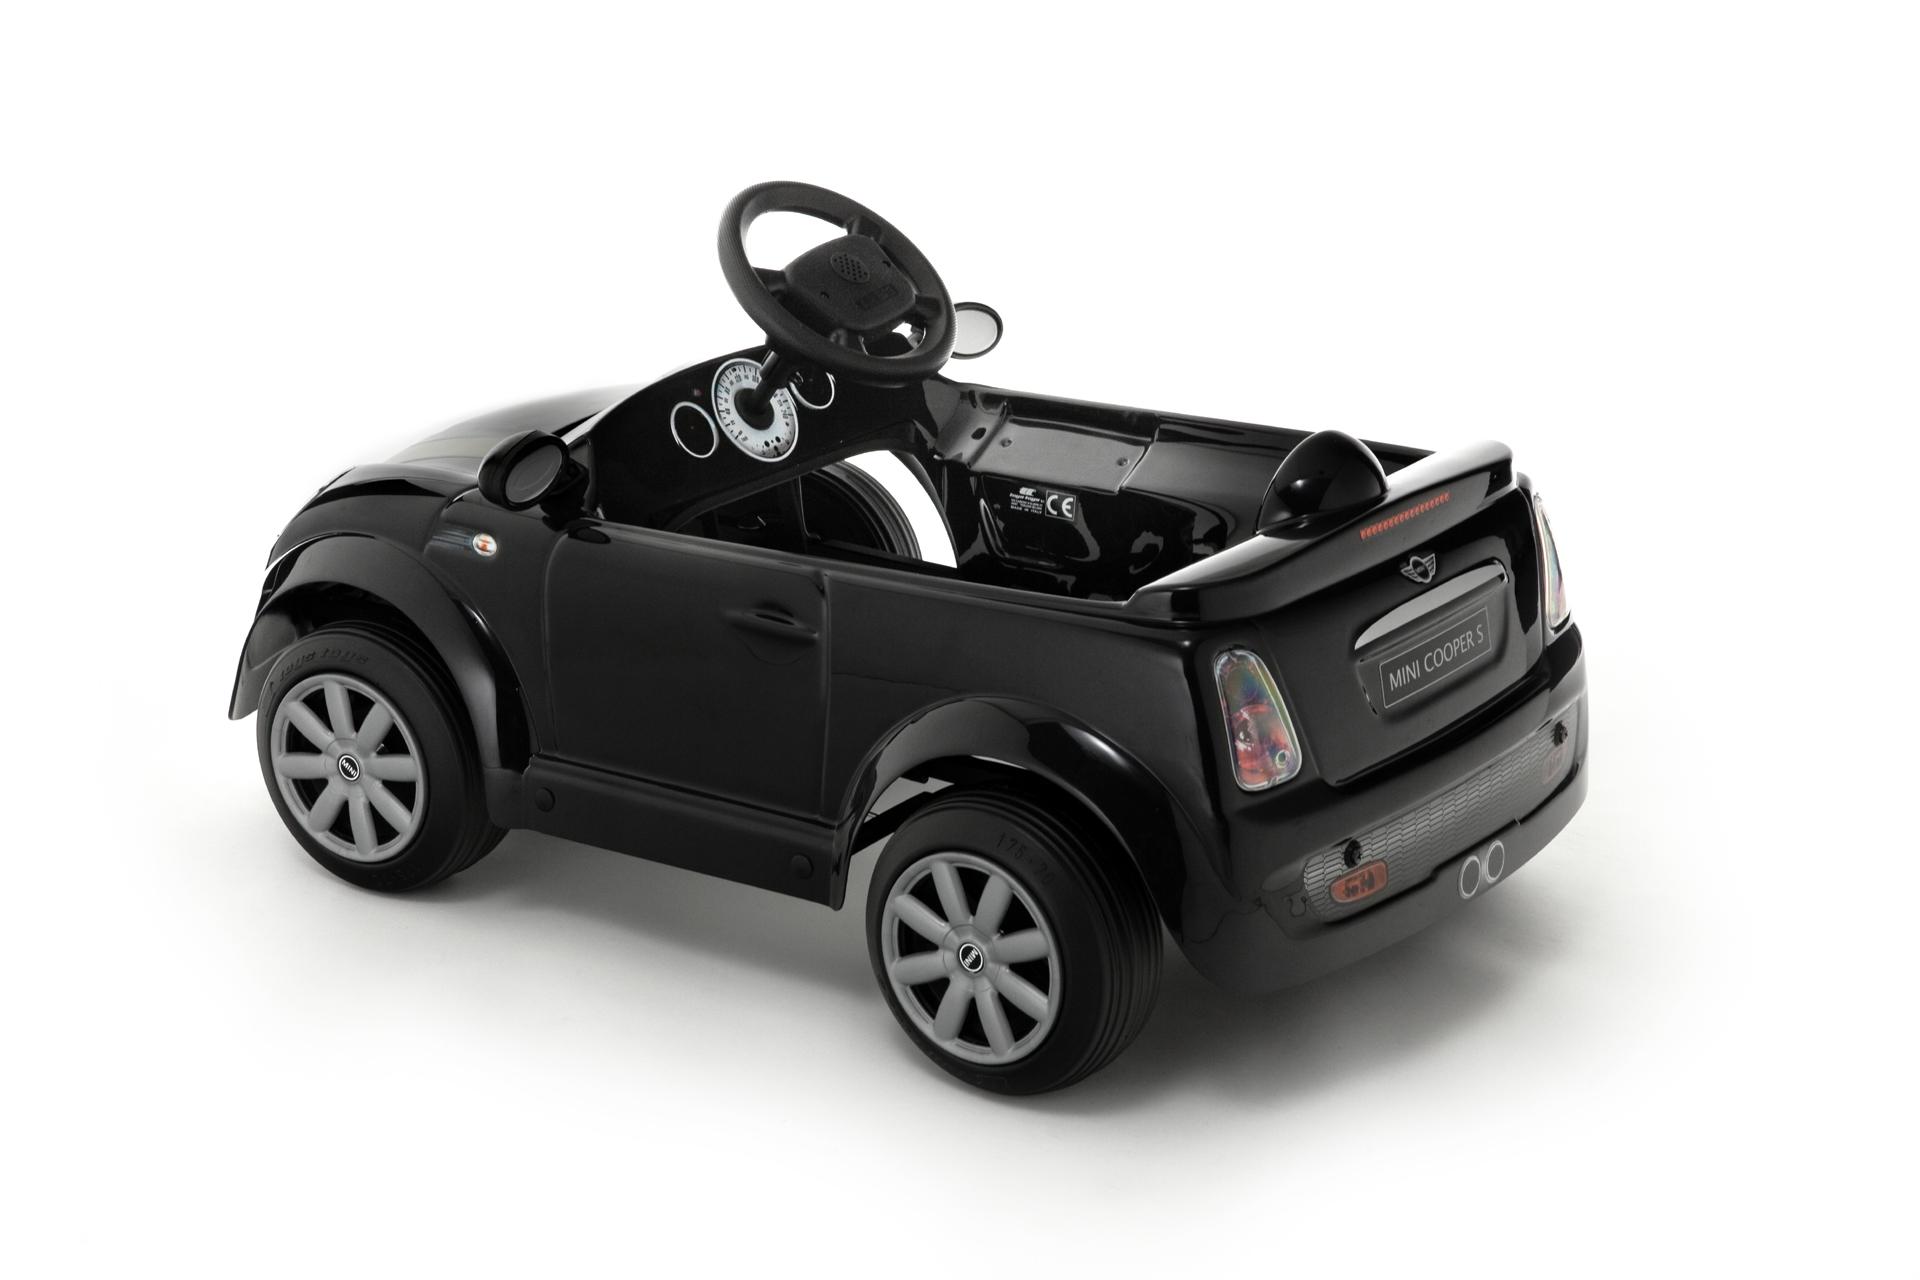 kinder elektroauto toys toys mini cooper s black edition. Black Bedroom Furniture Sets. Home Design Ideas